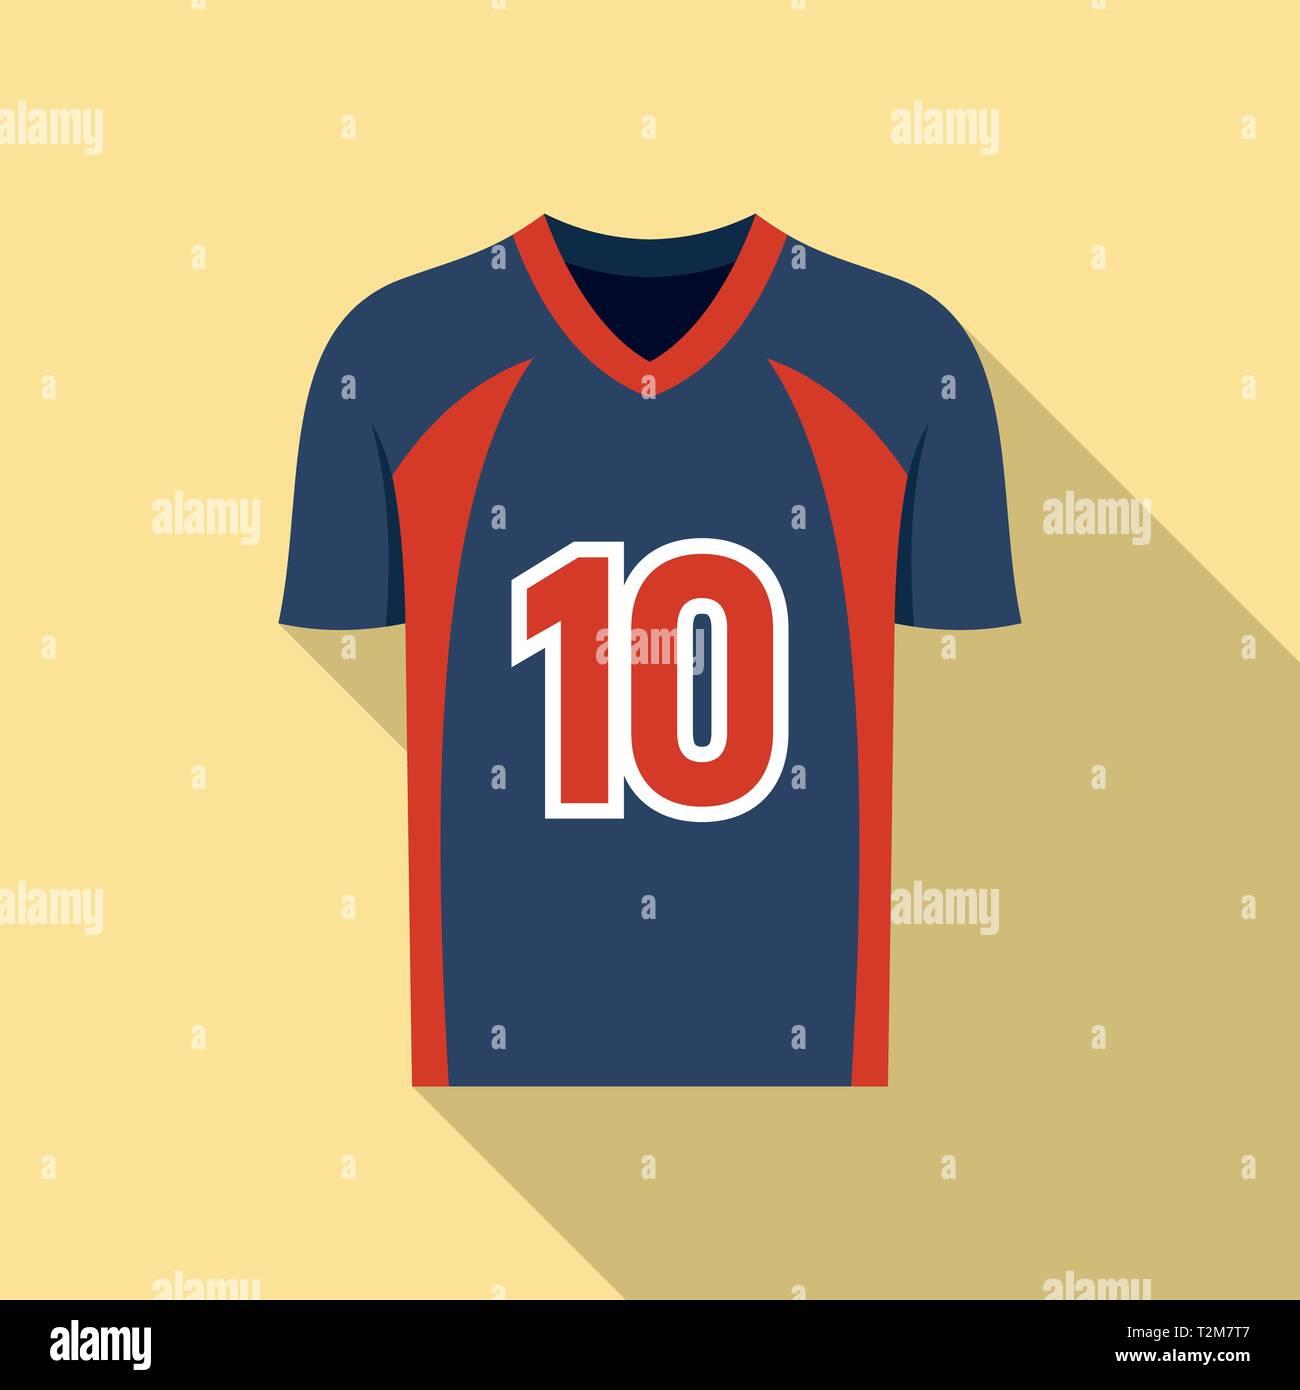 31e415436 American football jersey icon. Flat illustration of american football  jersey vector icon for web design